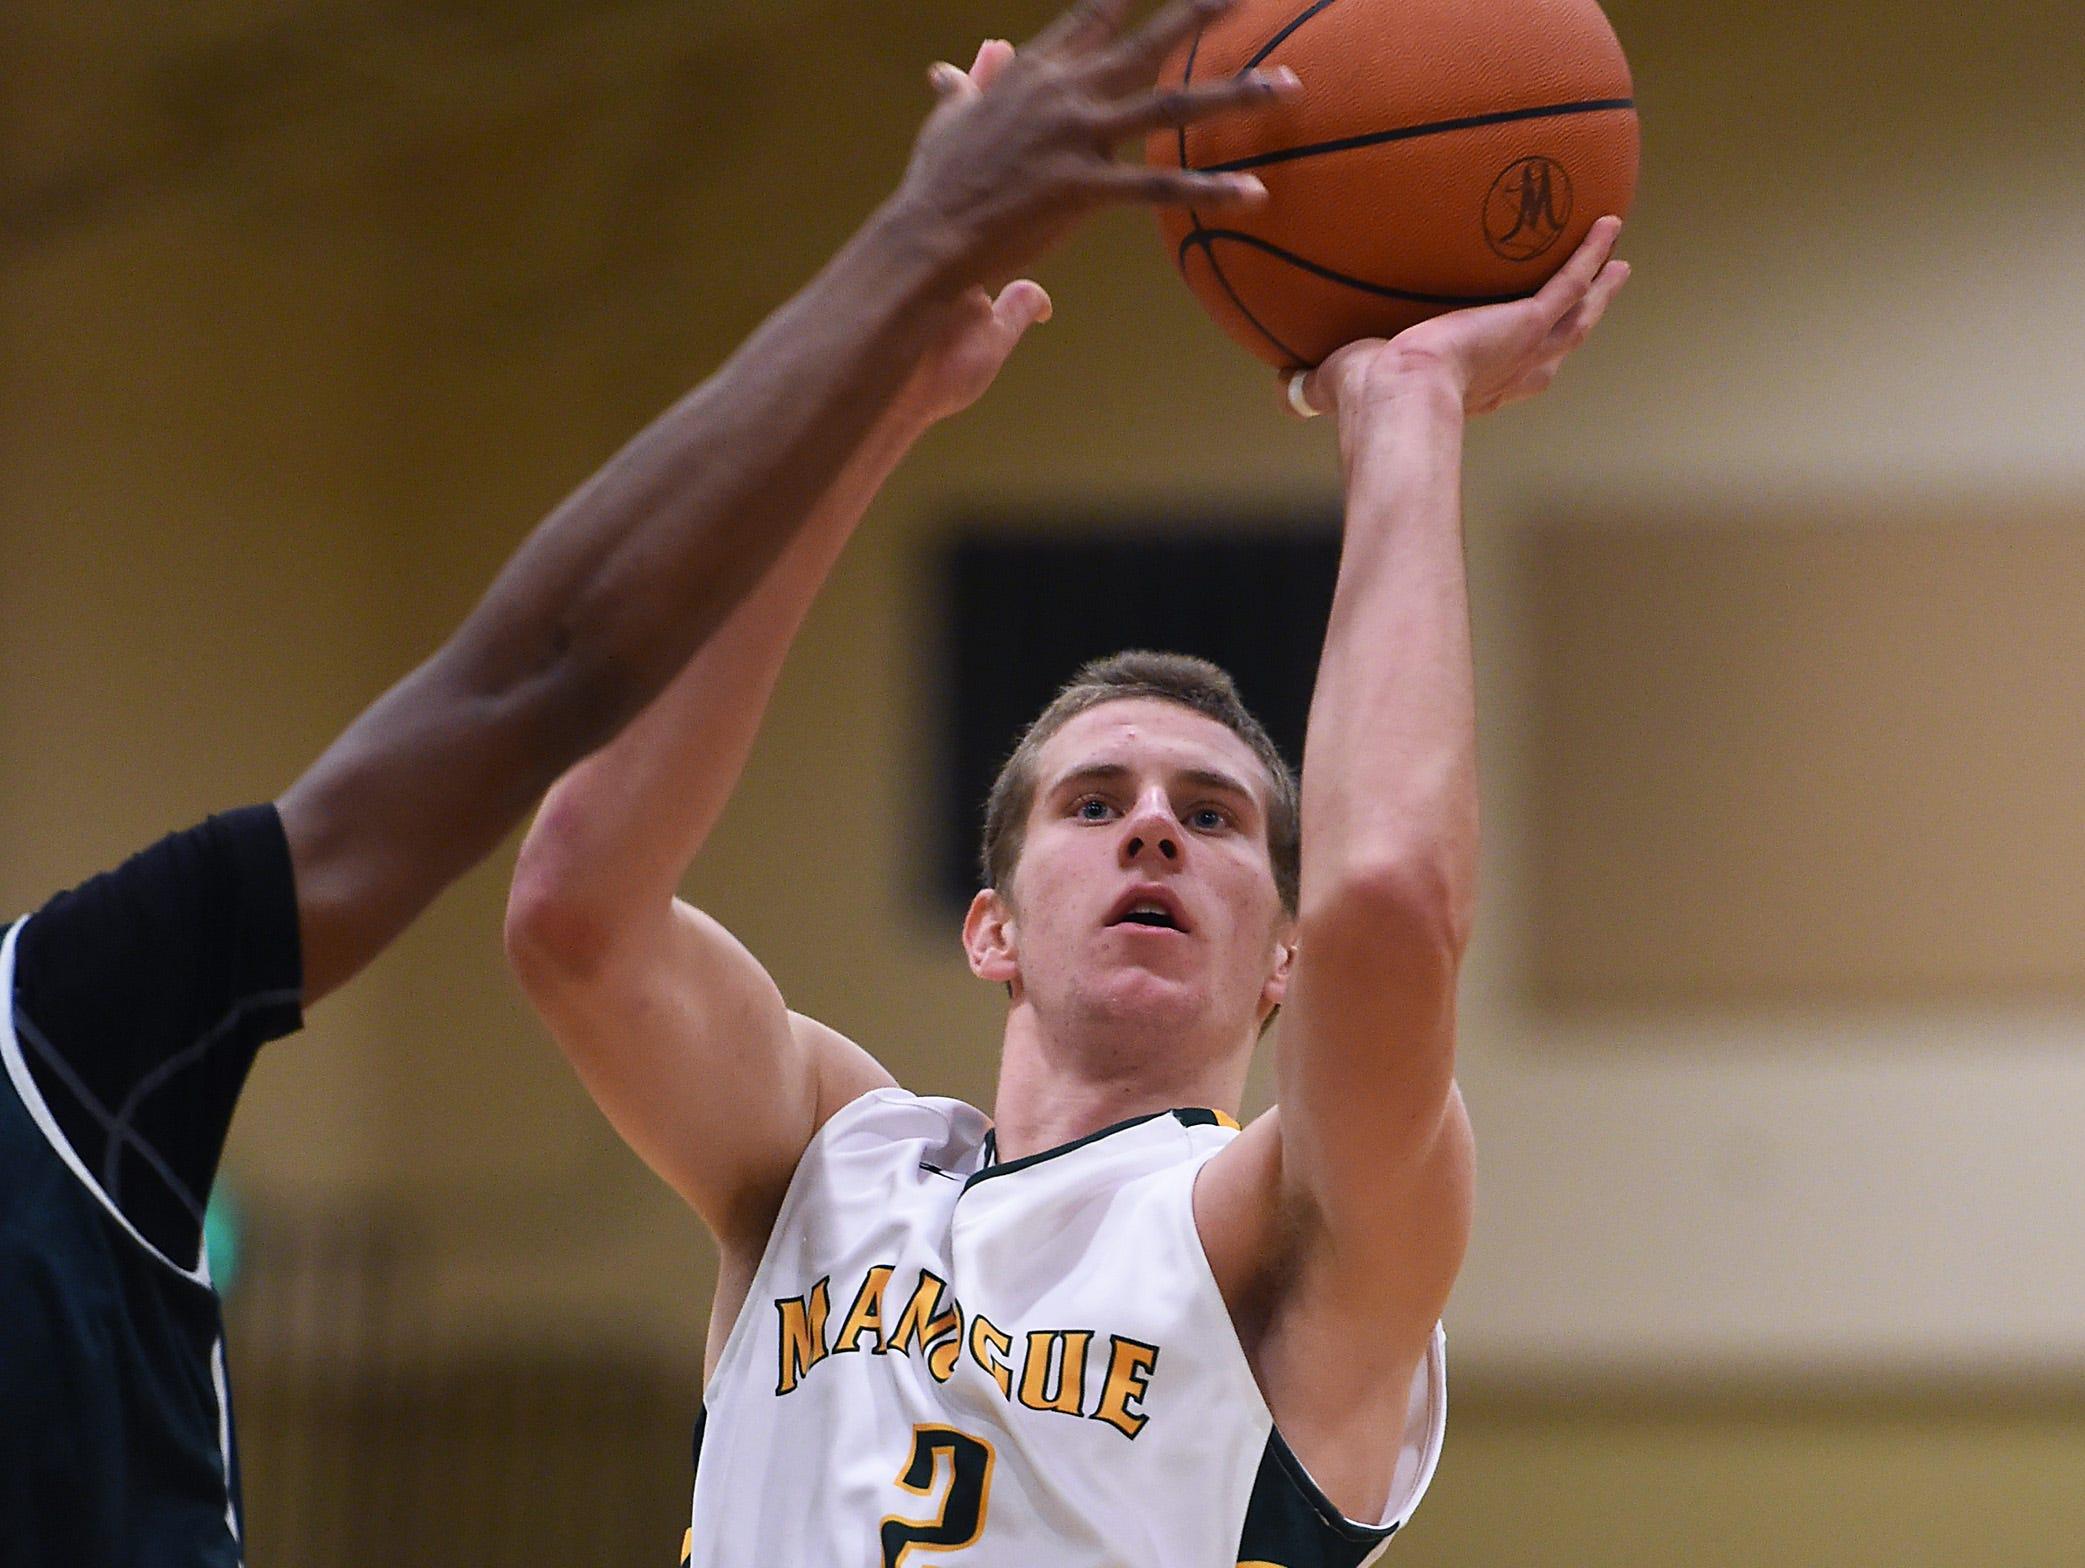 Bishop Manogue's Derek Novsek will play basketball for Rend Lake College in Ina, Ill.